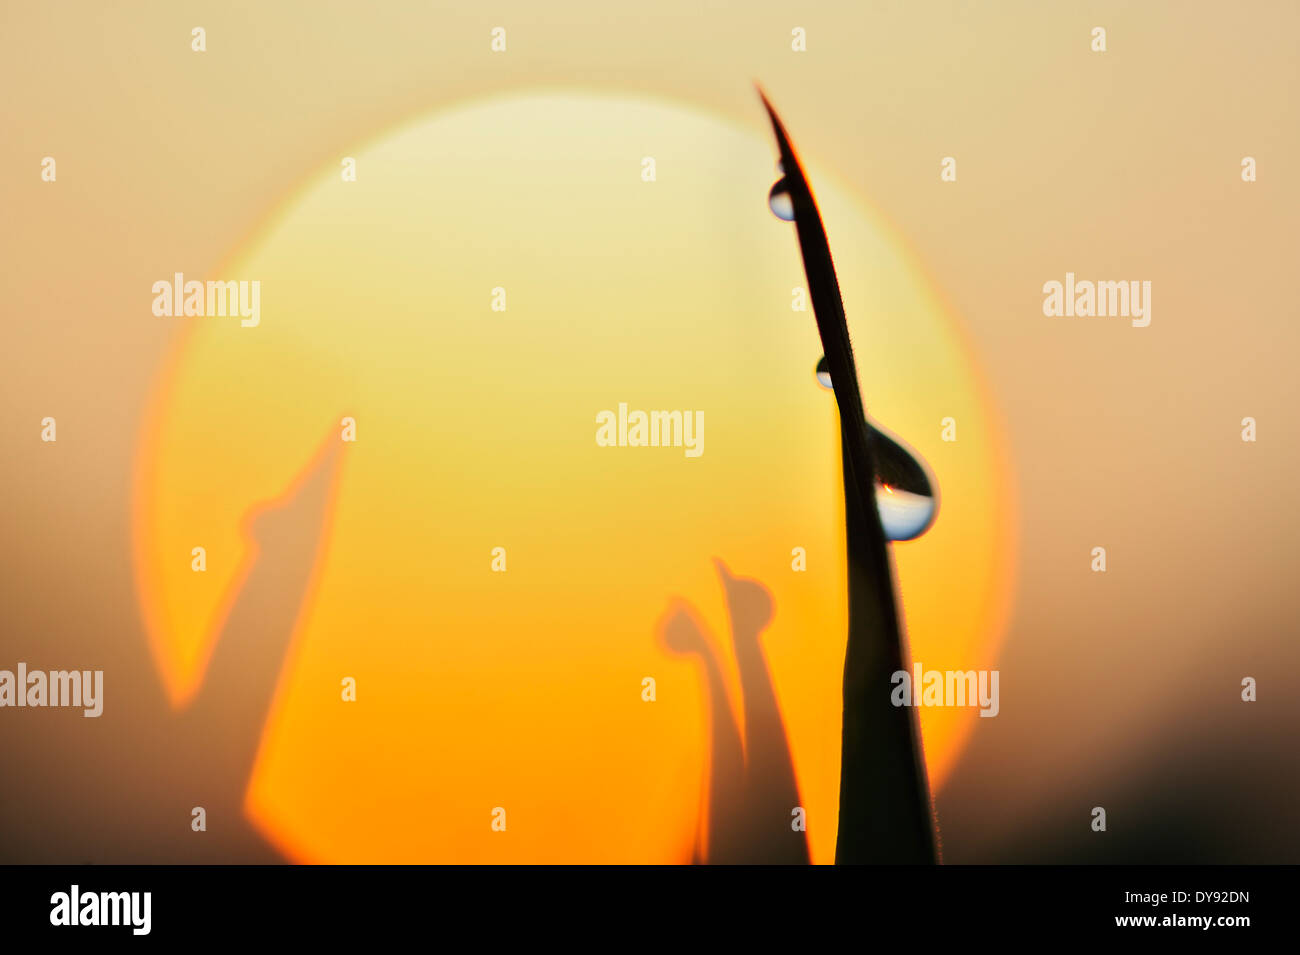 Gocce di rugiada sul filo d'erba a sunrise, close-up Immagini Stock